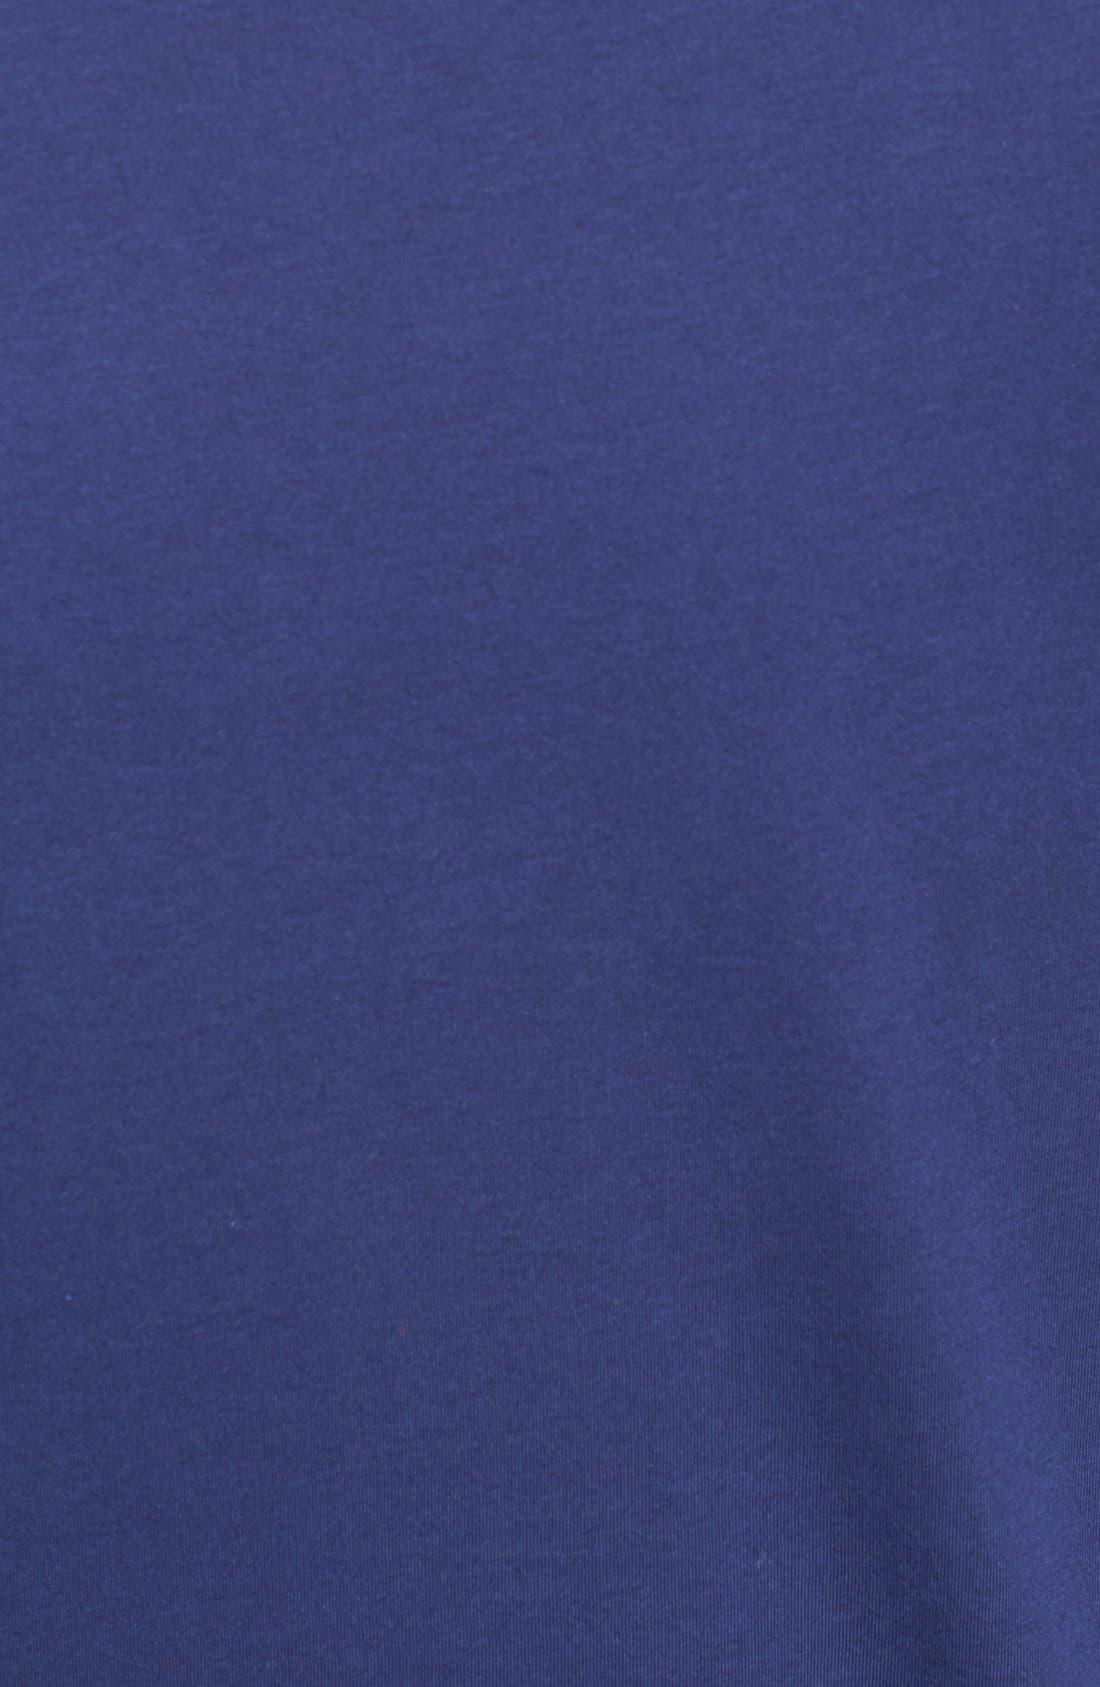 V-Neck Peruvian Pima Cotton T-Shirt,                             Alternate thumbnail 3, color,                             NAVY